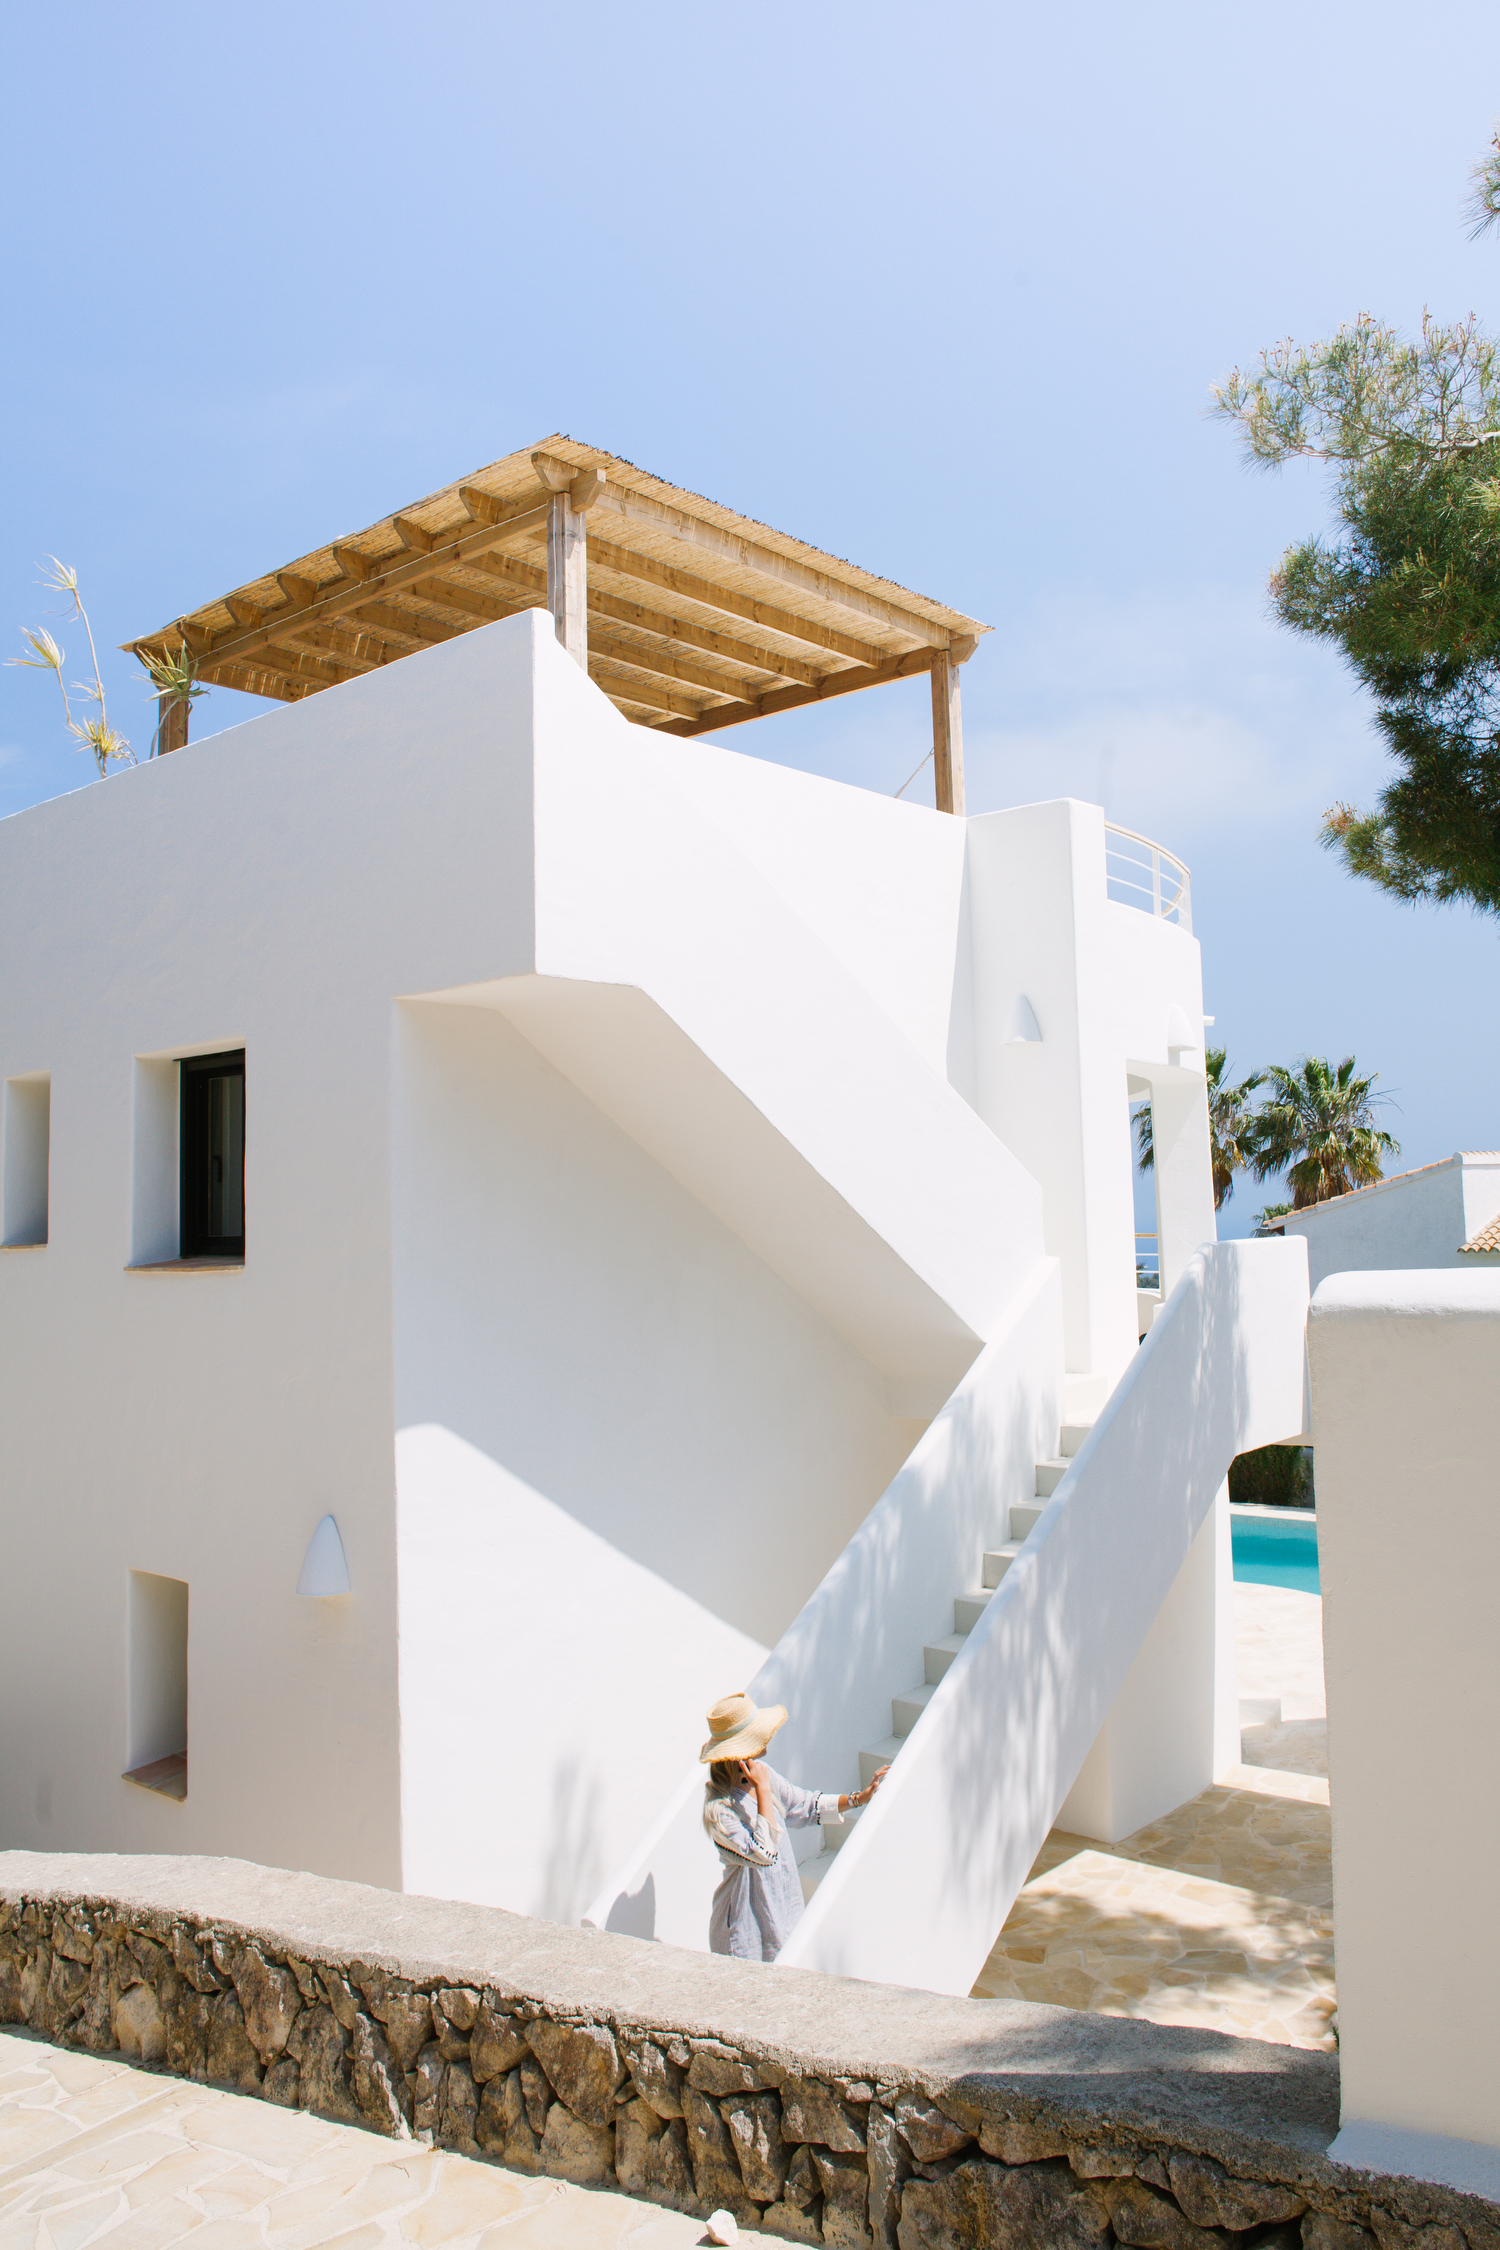 jessica_bataille_living_mediterranean_homes_workhouse_collective_58jessica_bataille_living_mediterranean_homes_workhouse_collective_IMG_9763.jpg_58.JPG